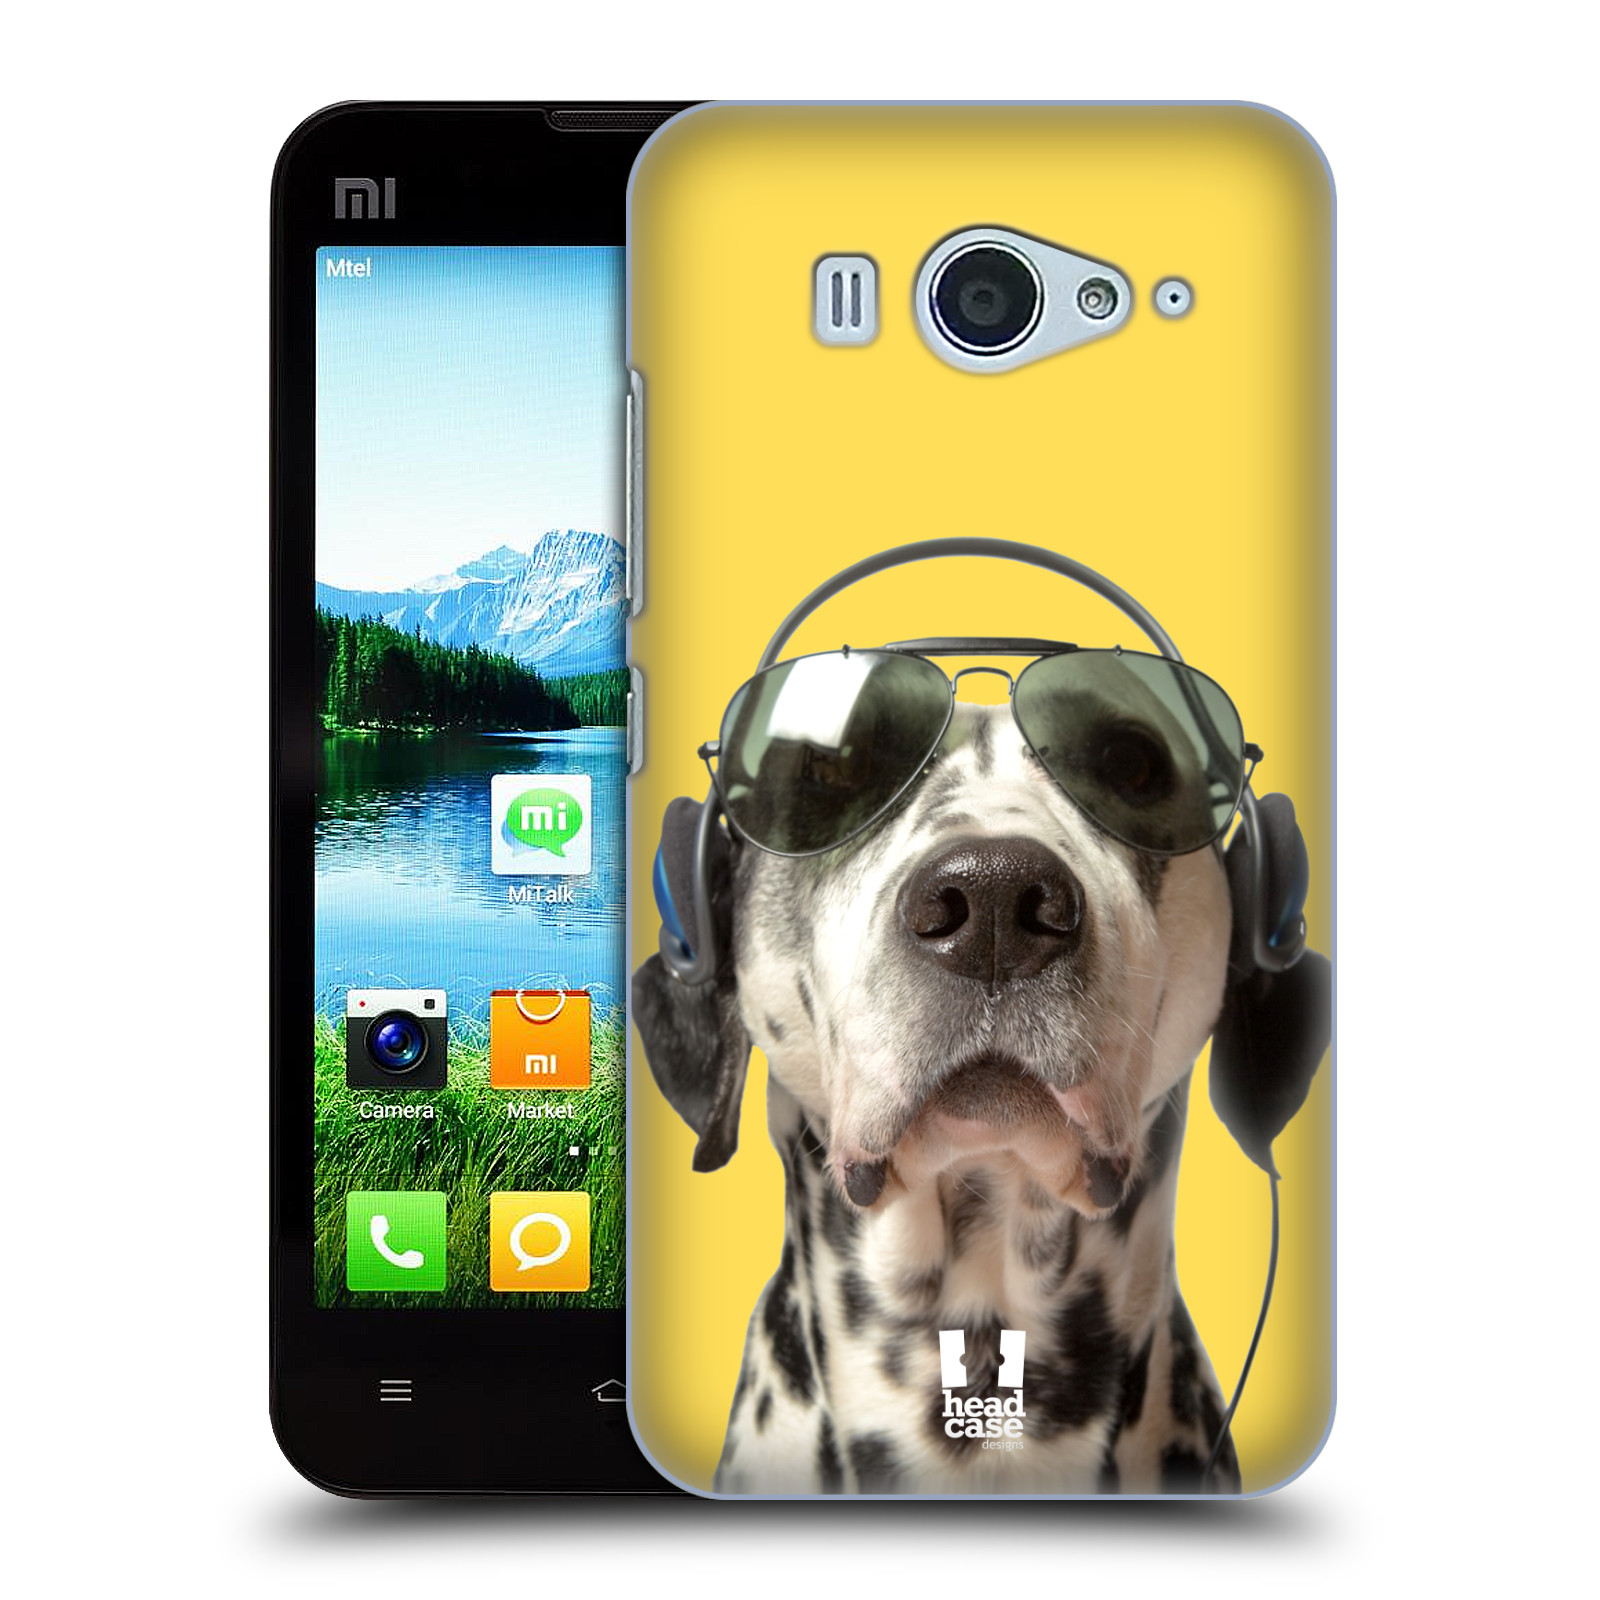 HEAD CASE pevný plastový obal na mobil XIAOMI MI2s vzor Legrační zvířátka dalmatin se sluchátky žlutá